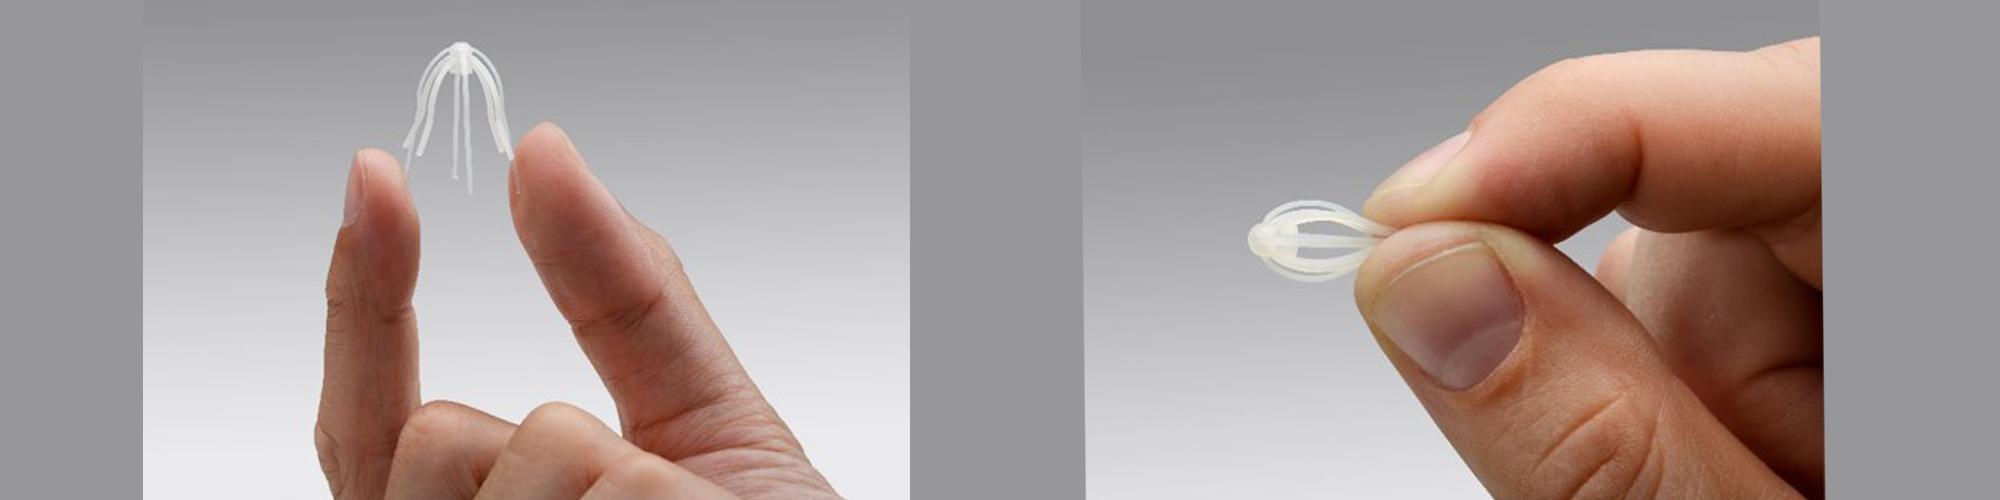 TSI Mometasone Implant Banner